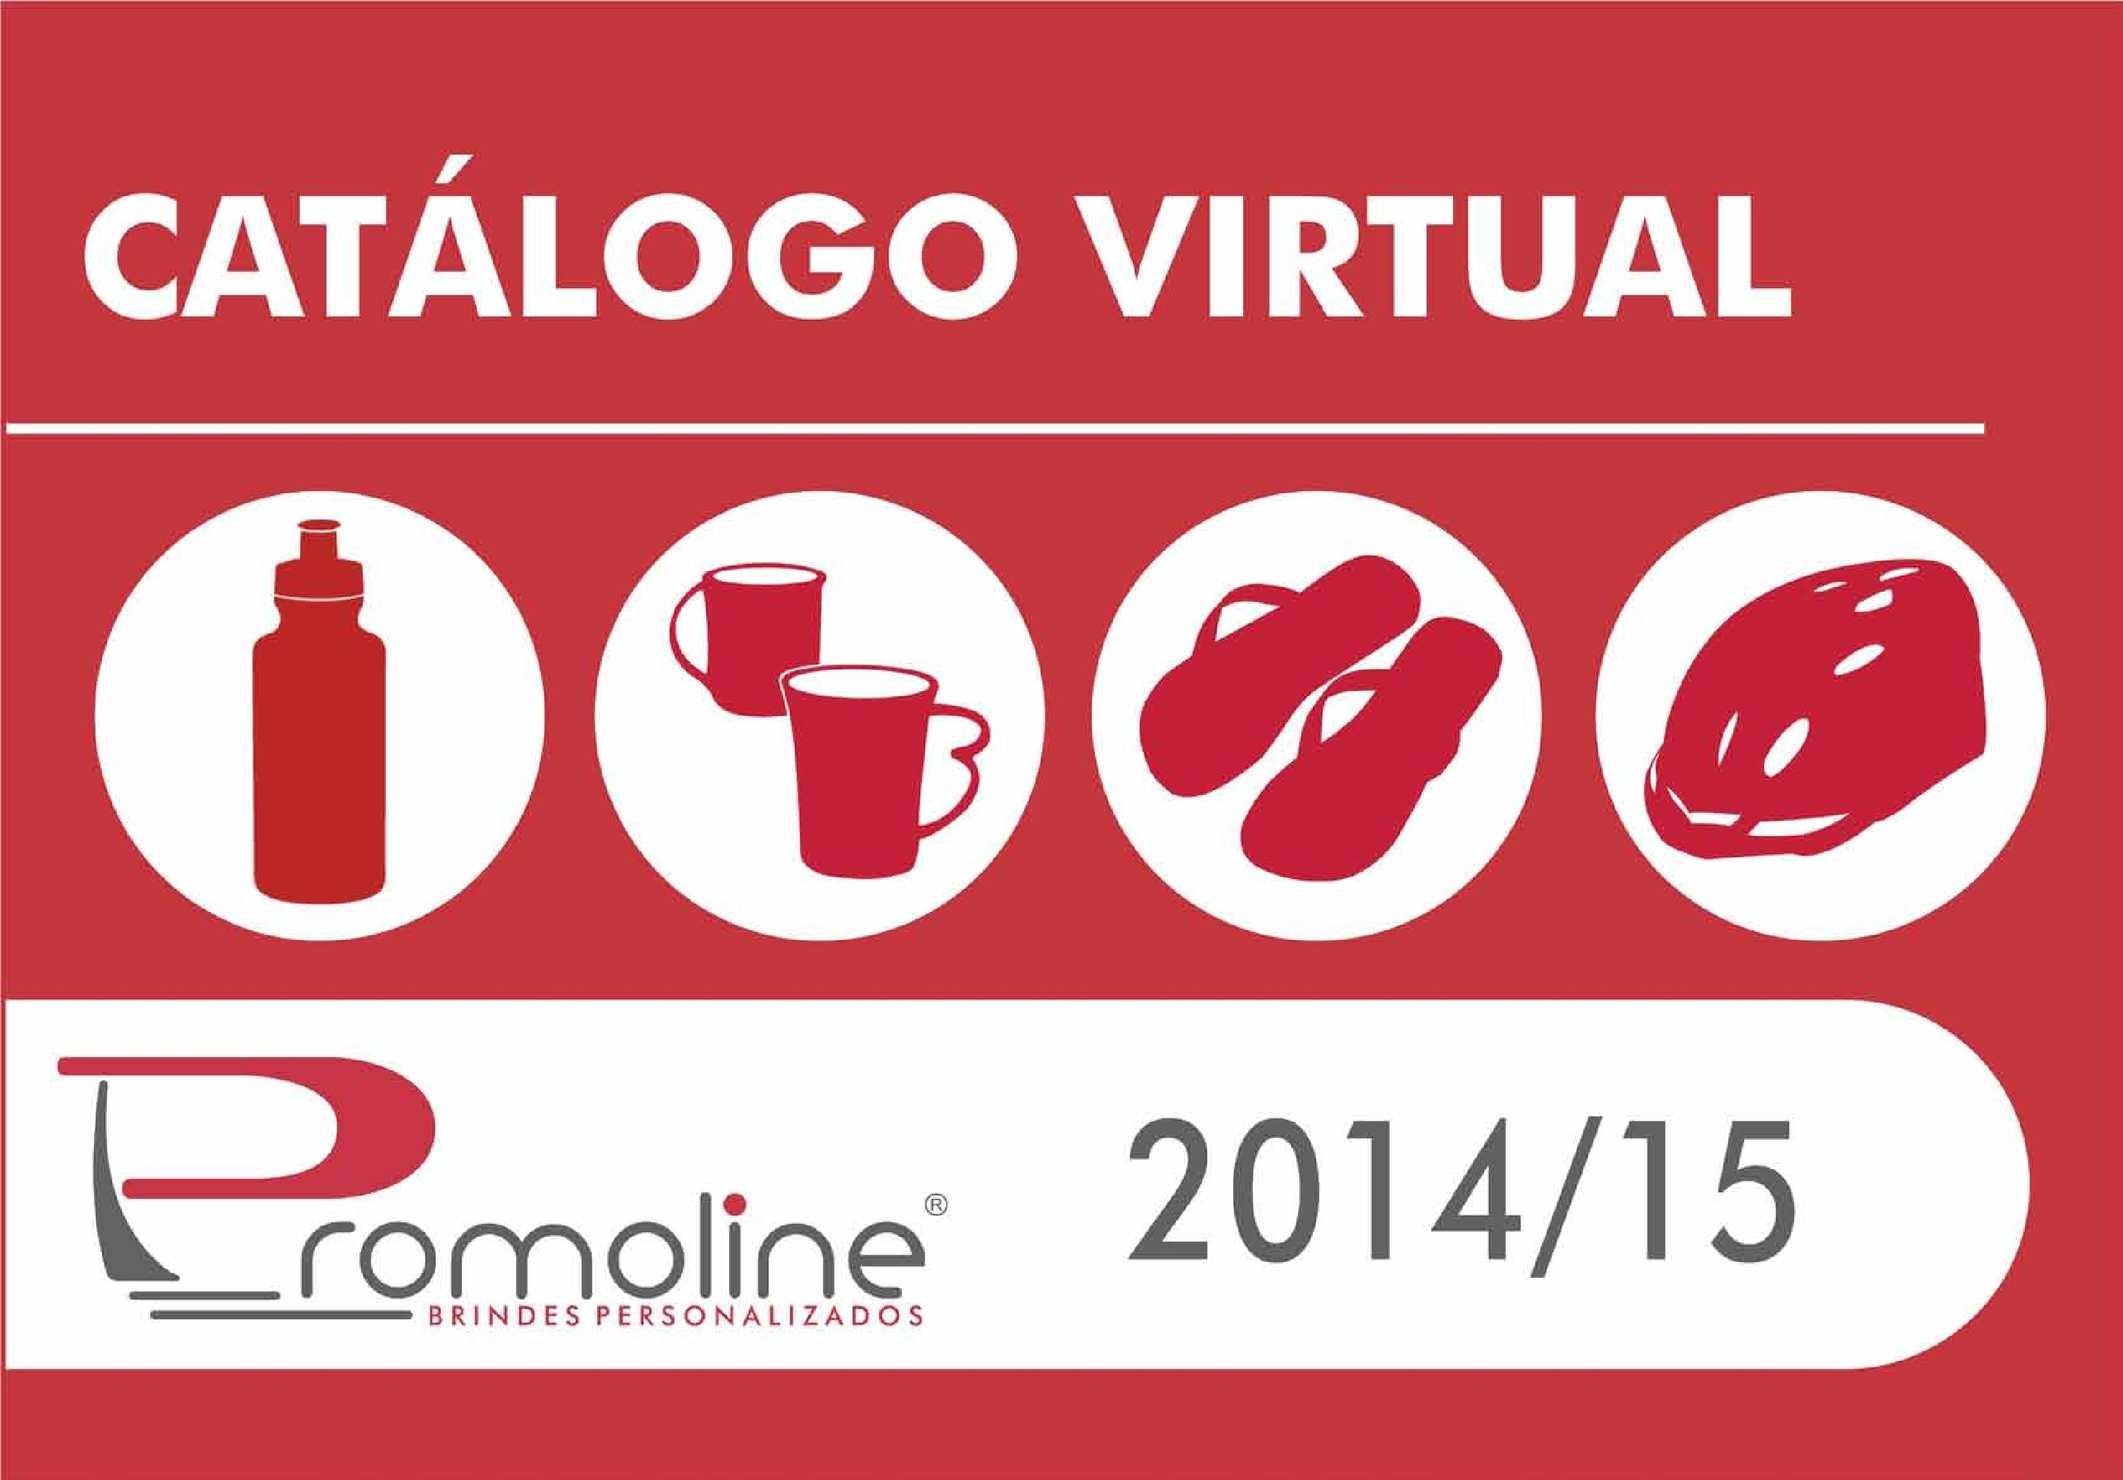 cdaf98110c Calaméo - Catalogo 25 05 2015